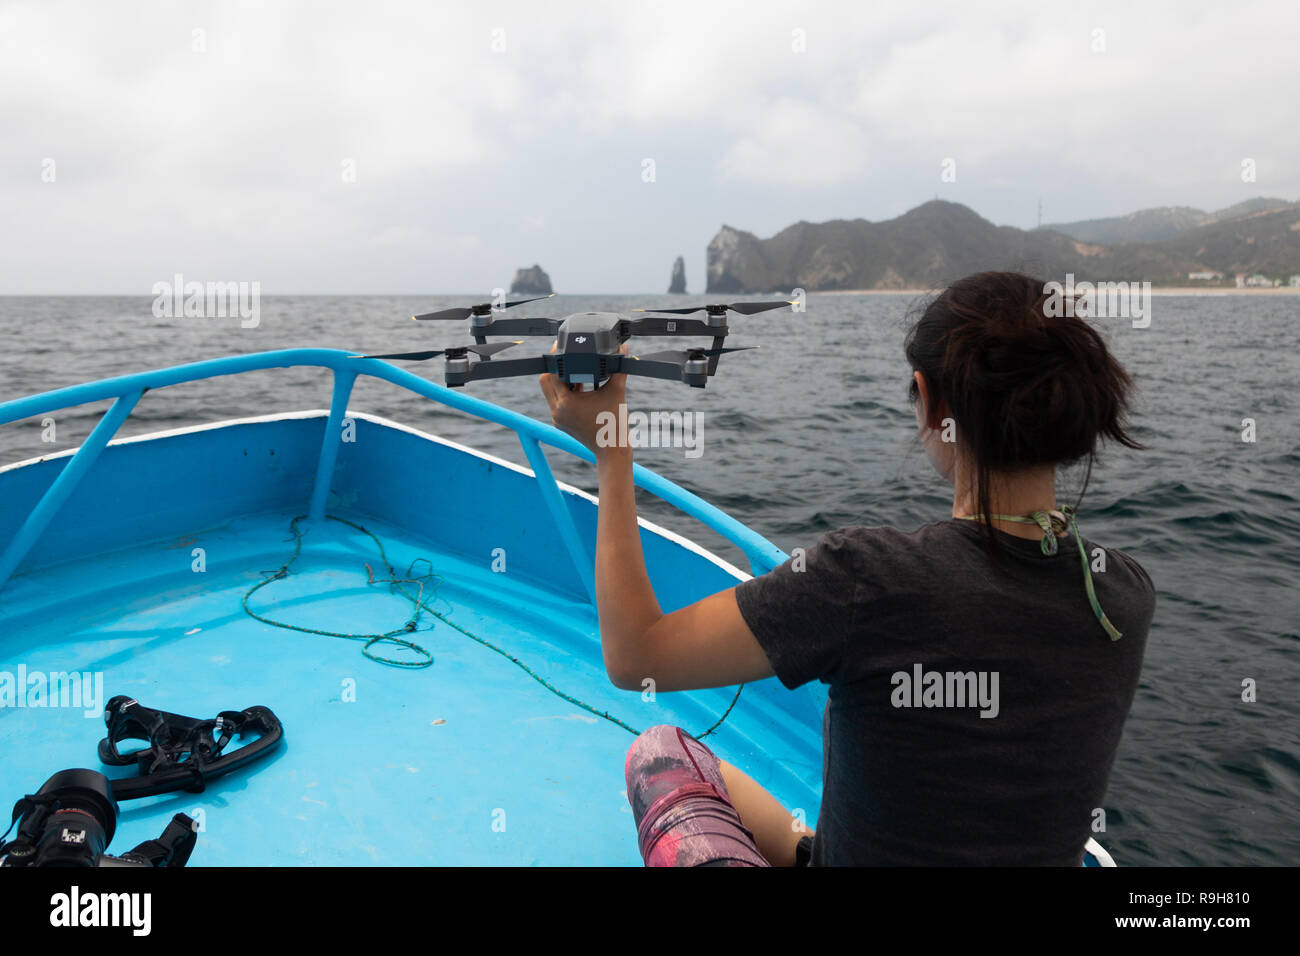 DJI Mavic Pro chasing chasing whales in Ecuador - Stock Image